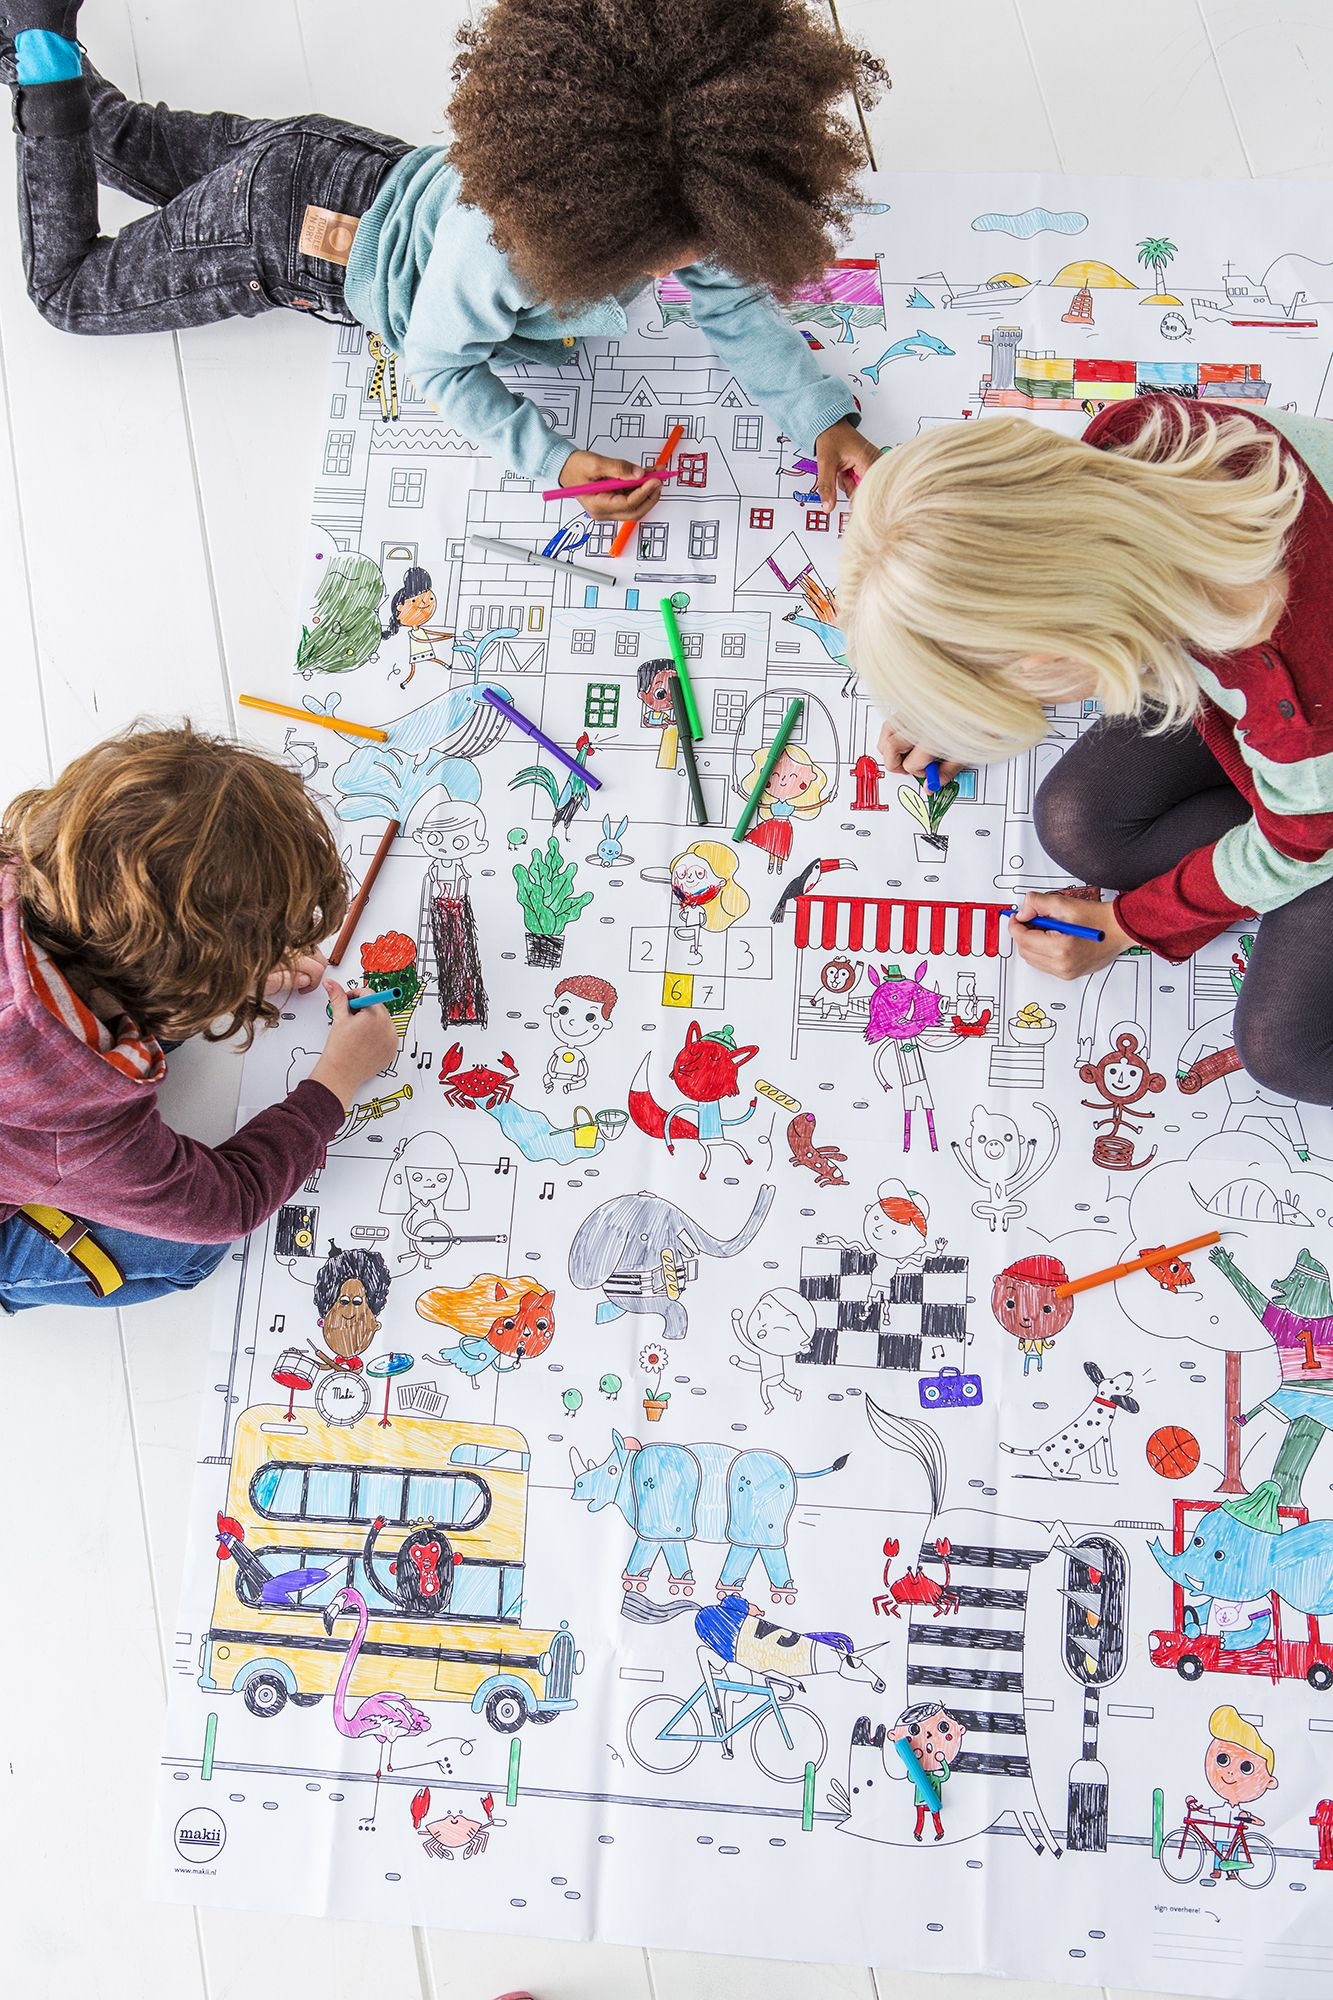 Grote Kleurplaat Makii Stad Littlelovedones Kleurplaten Kinderfeestje Stad